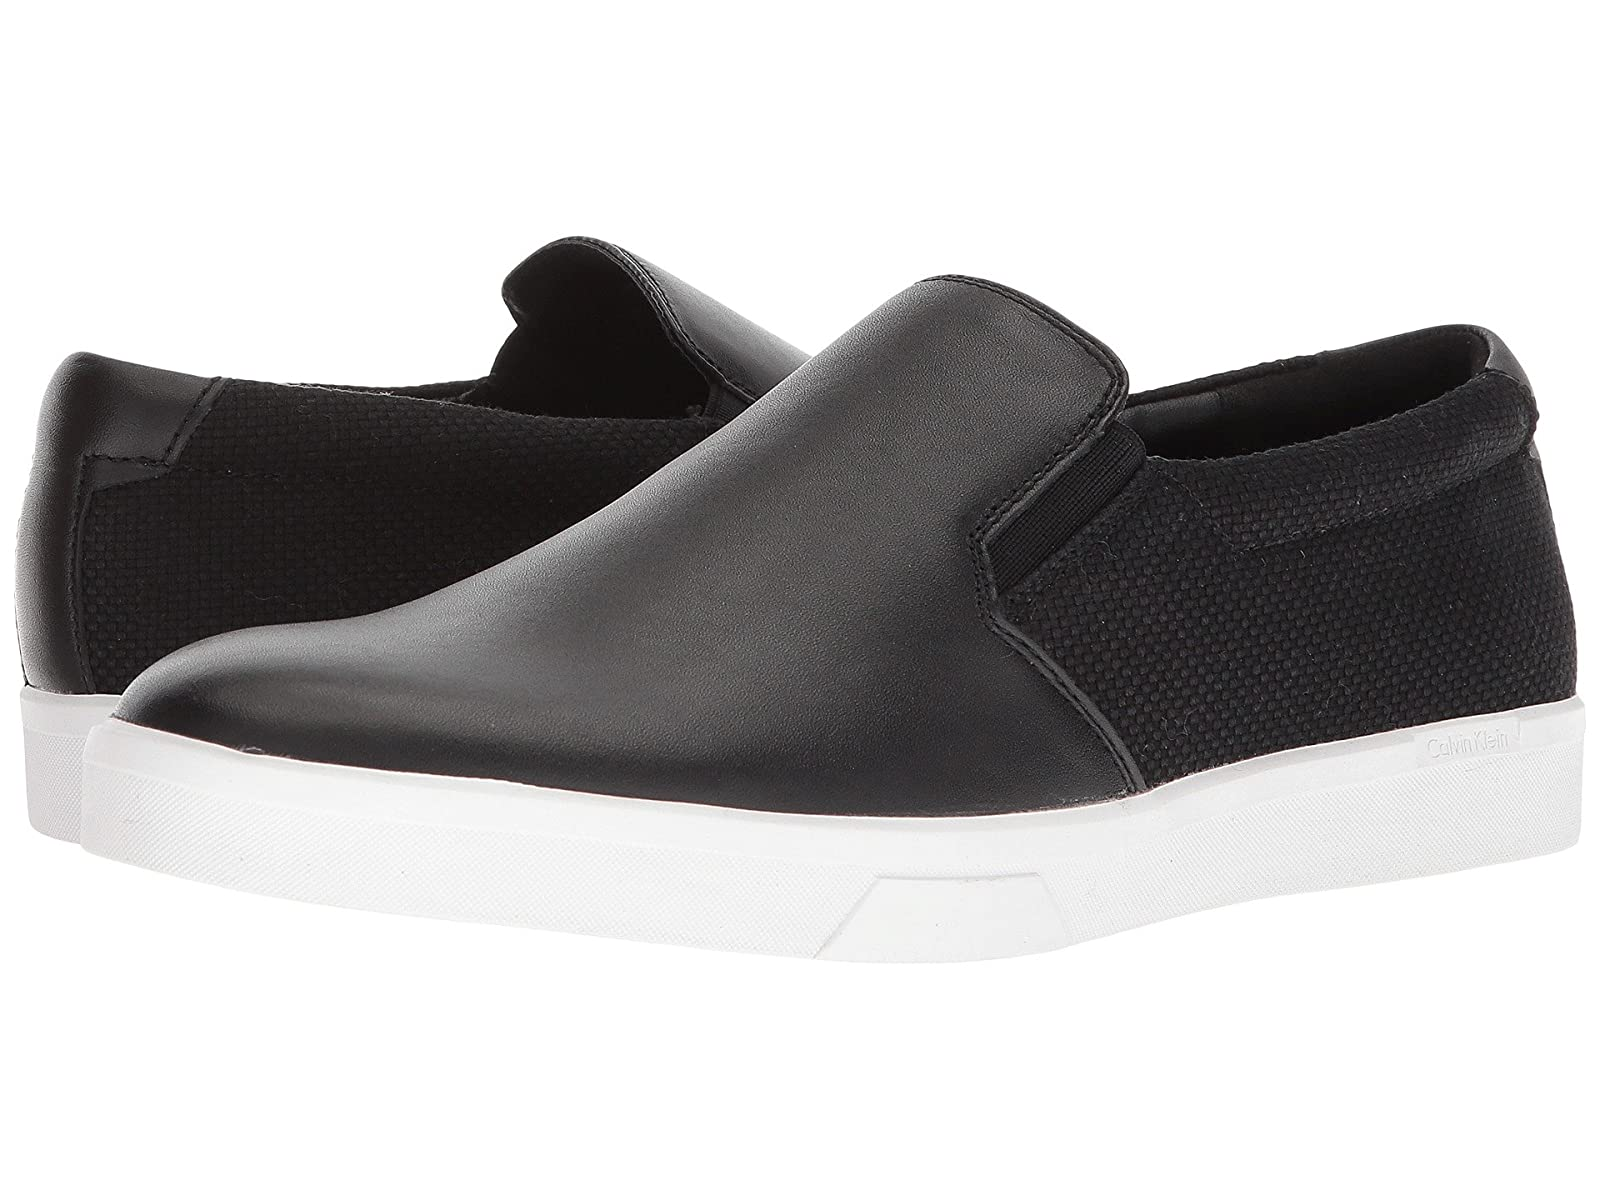 Calvin Klein IvoCheap and distinctive eye-catching shoes